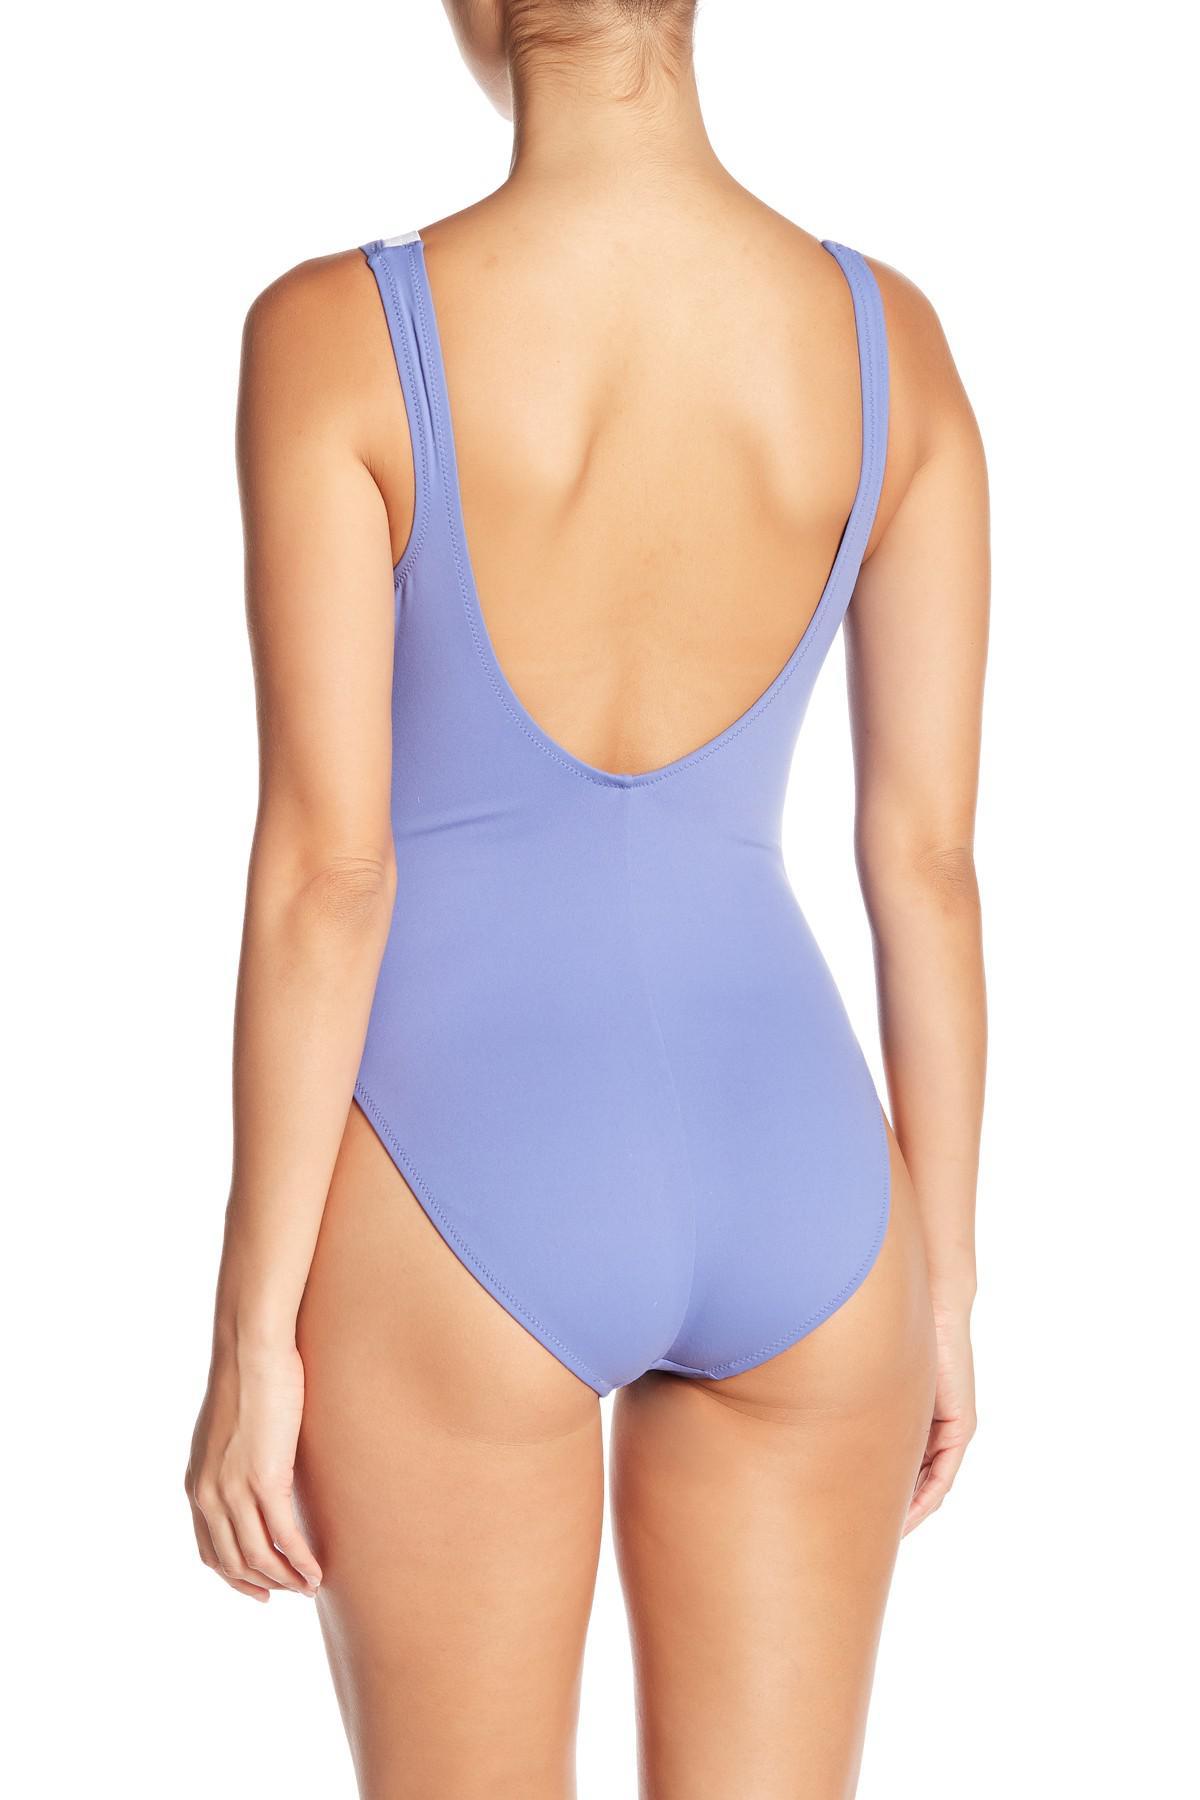 d3e7584cb4f5b Letarte - Blue Front Lace-up One-piece Swimsuit - Lyst. View fullscreen